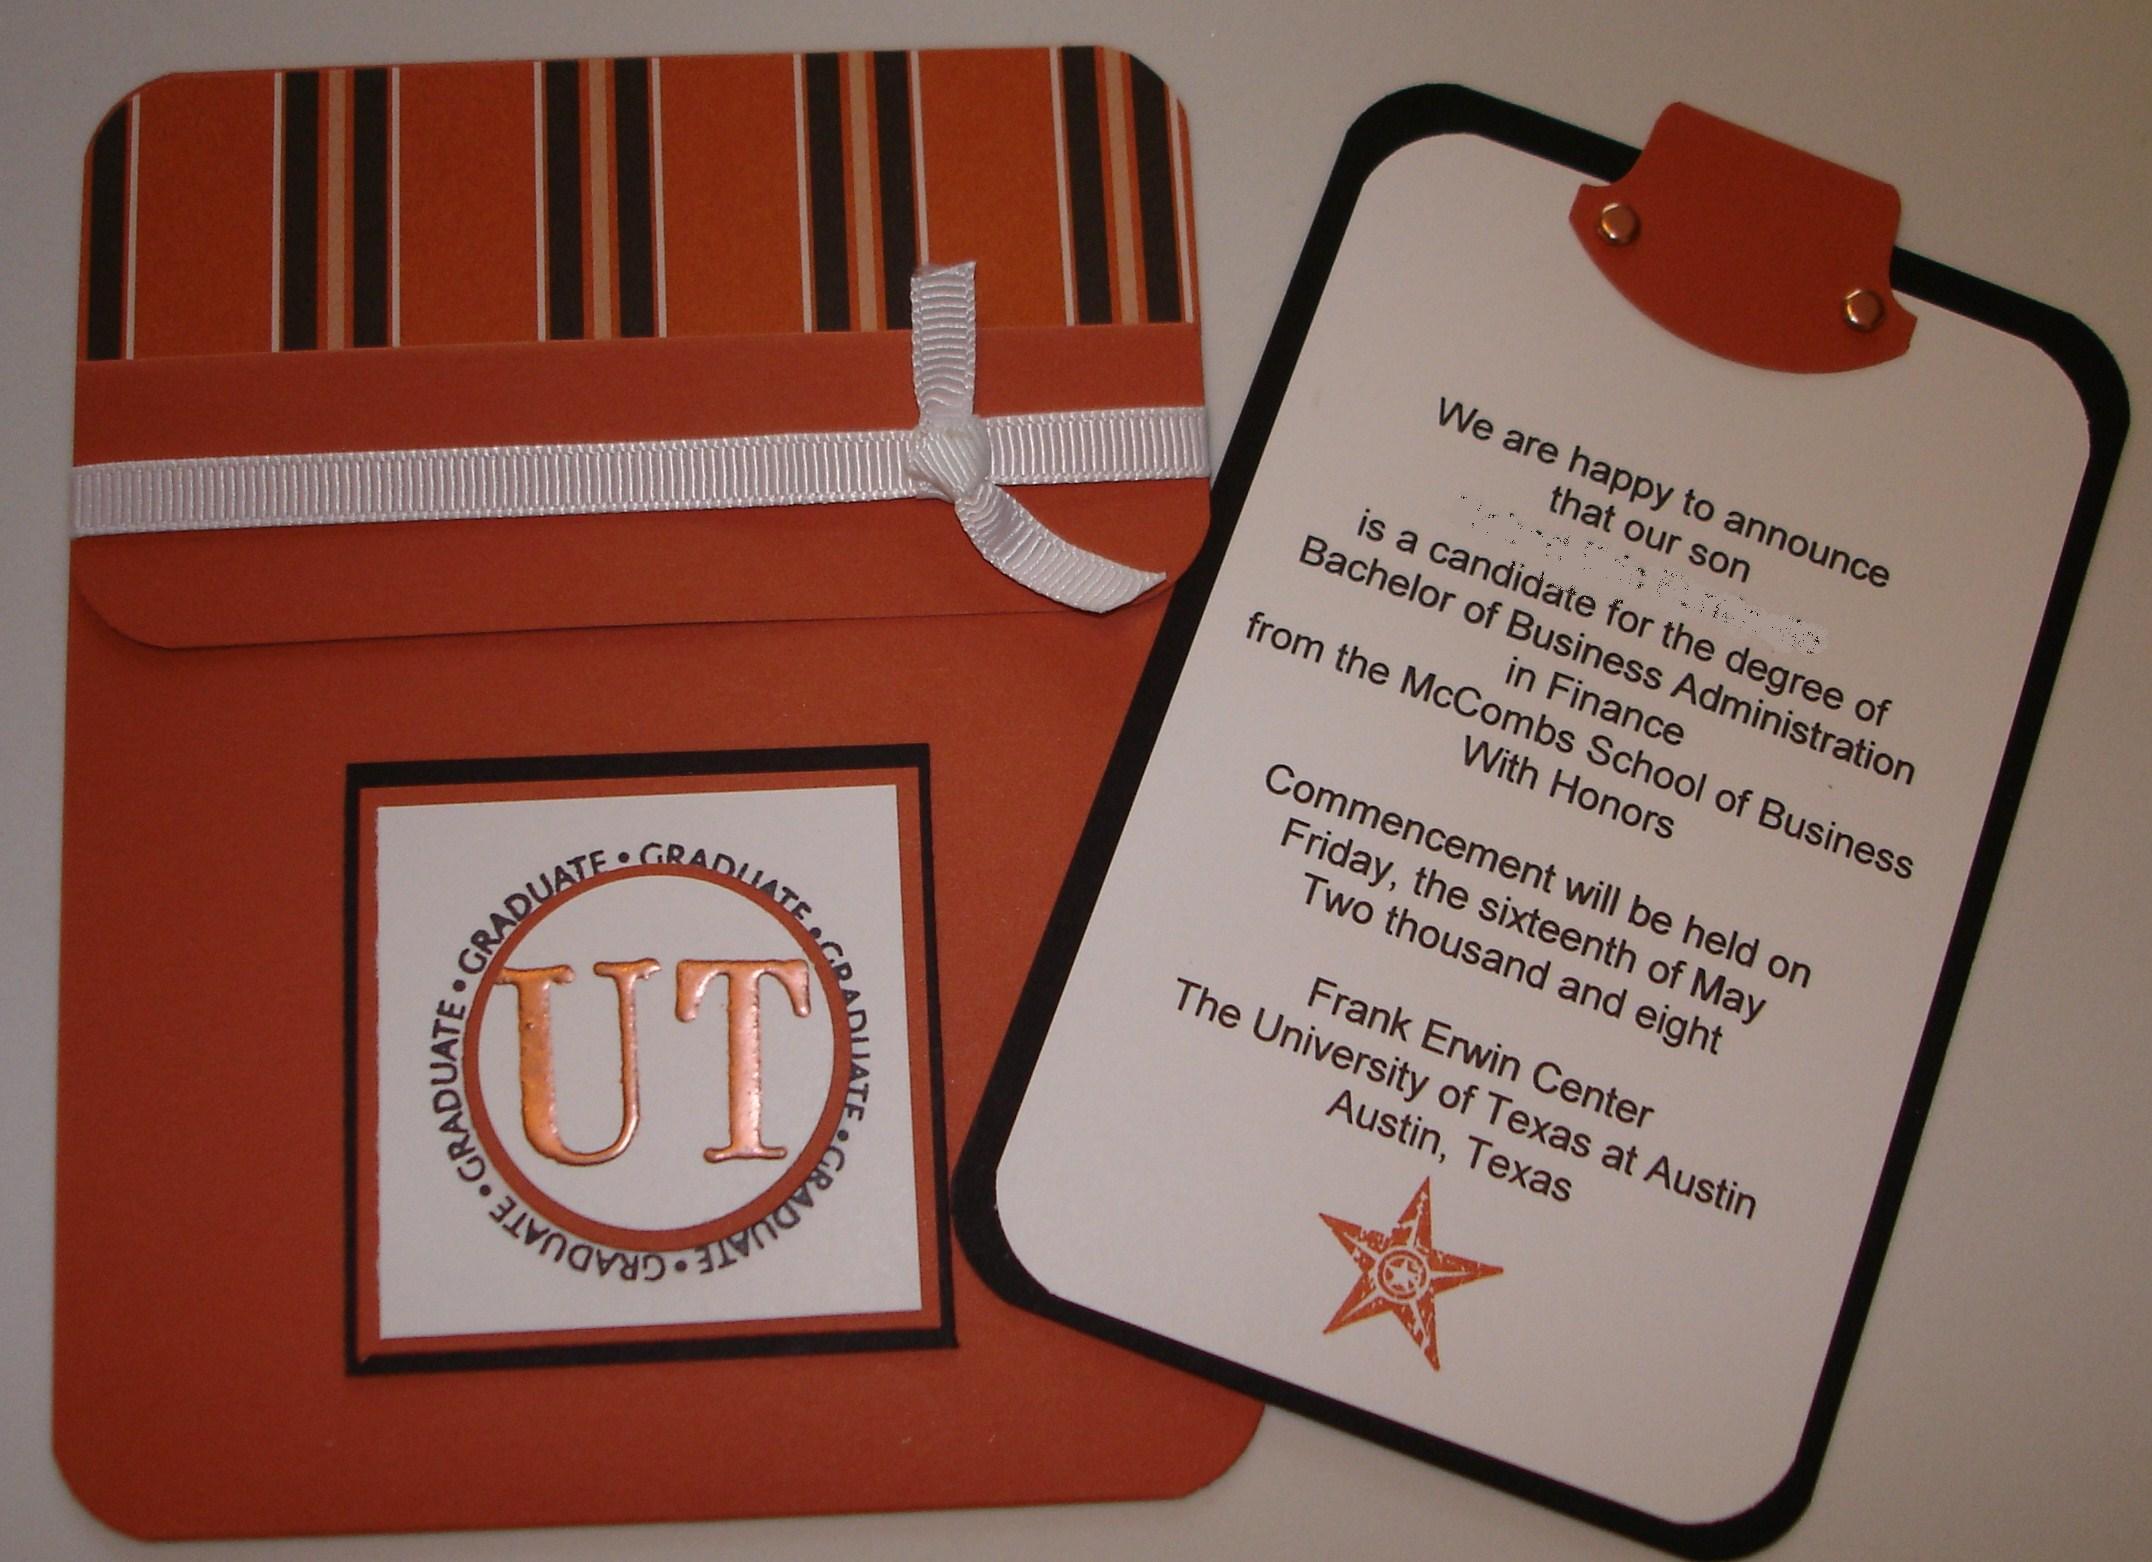 a pocket card college graduation announcement for ut